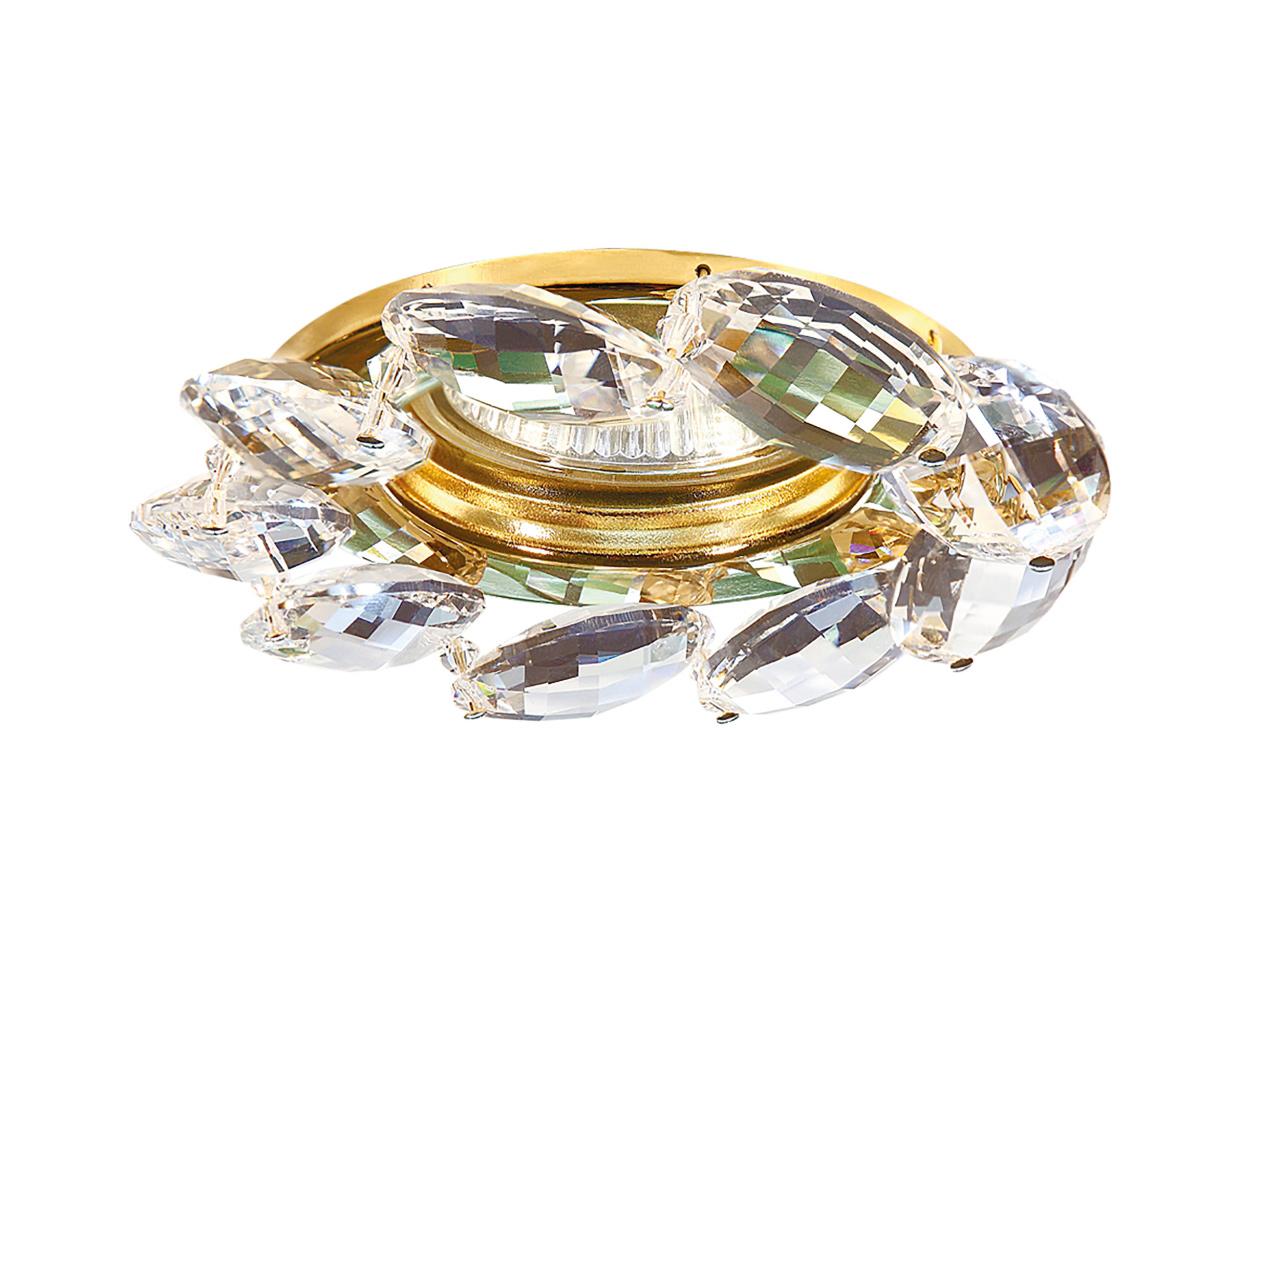 Светильник Noce MR16 / HP16 золото / прозрачный Lightstar 031902